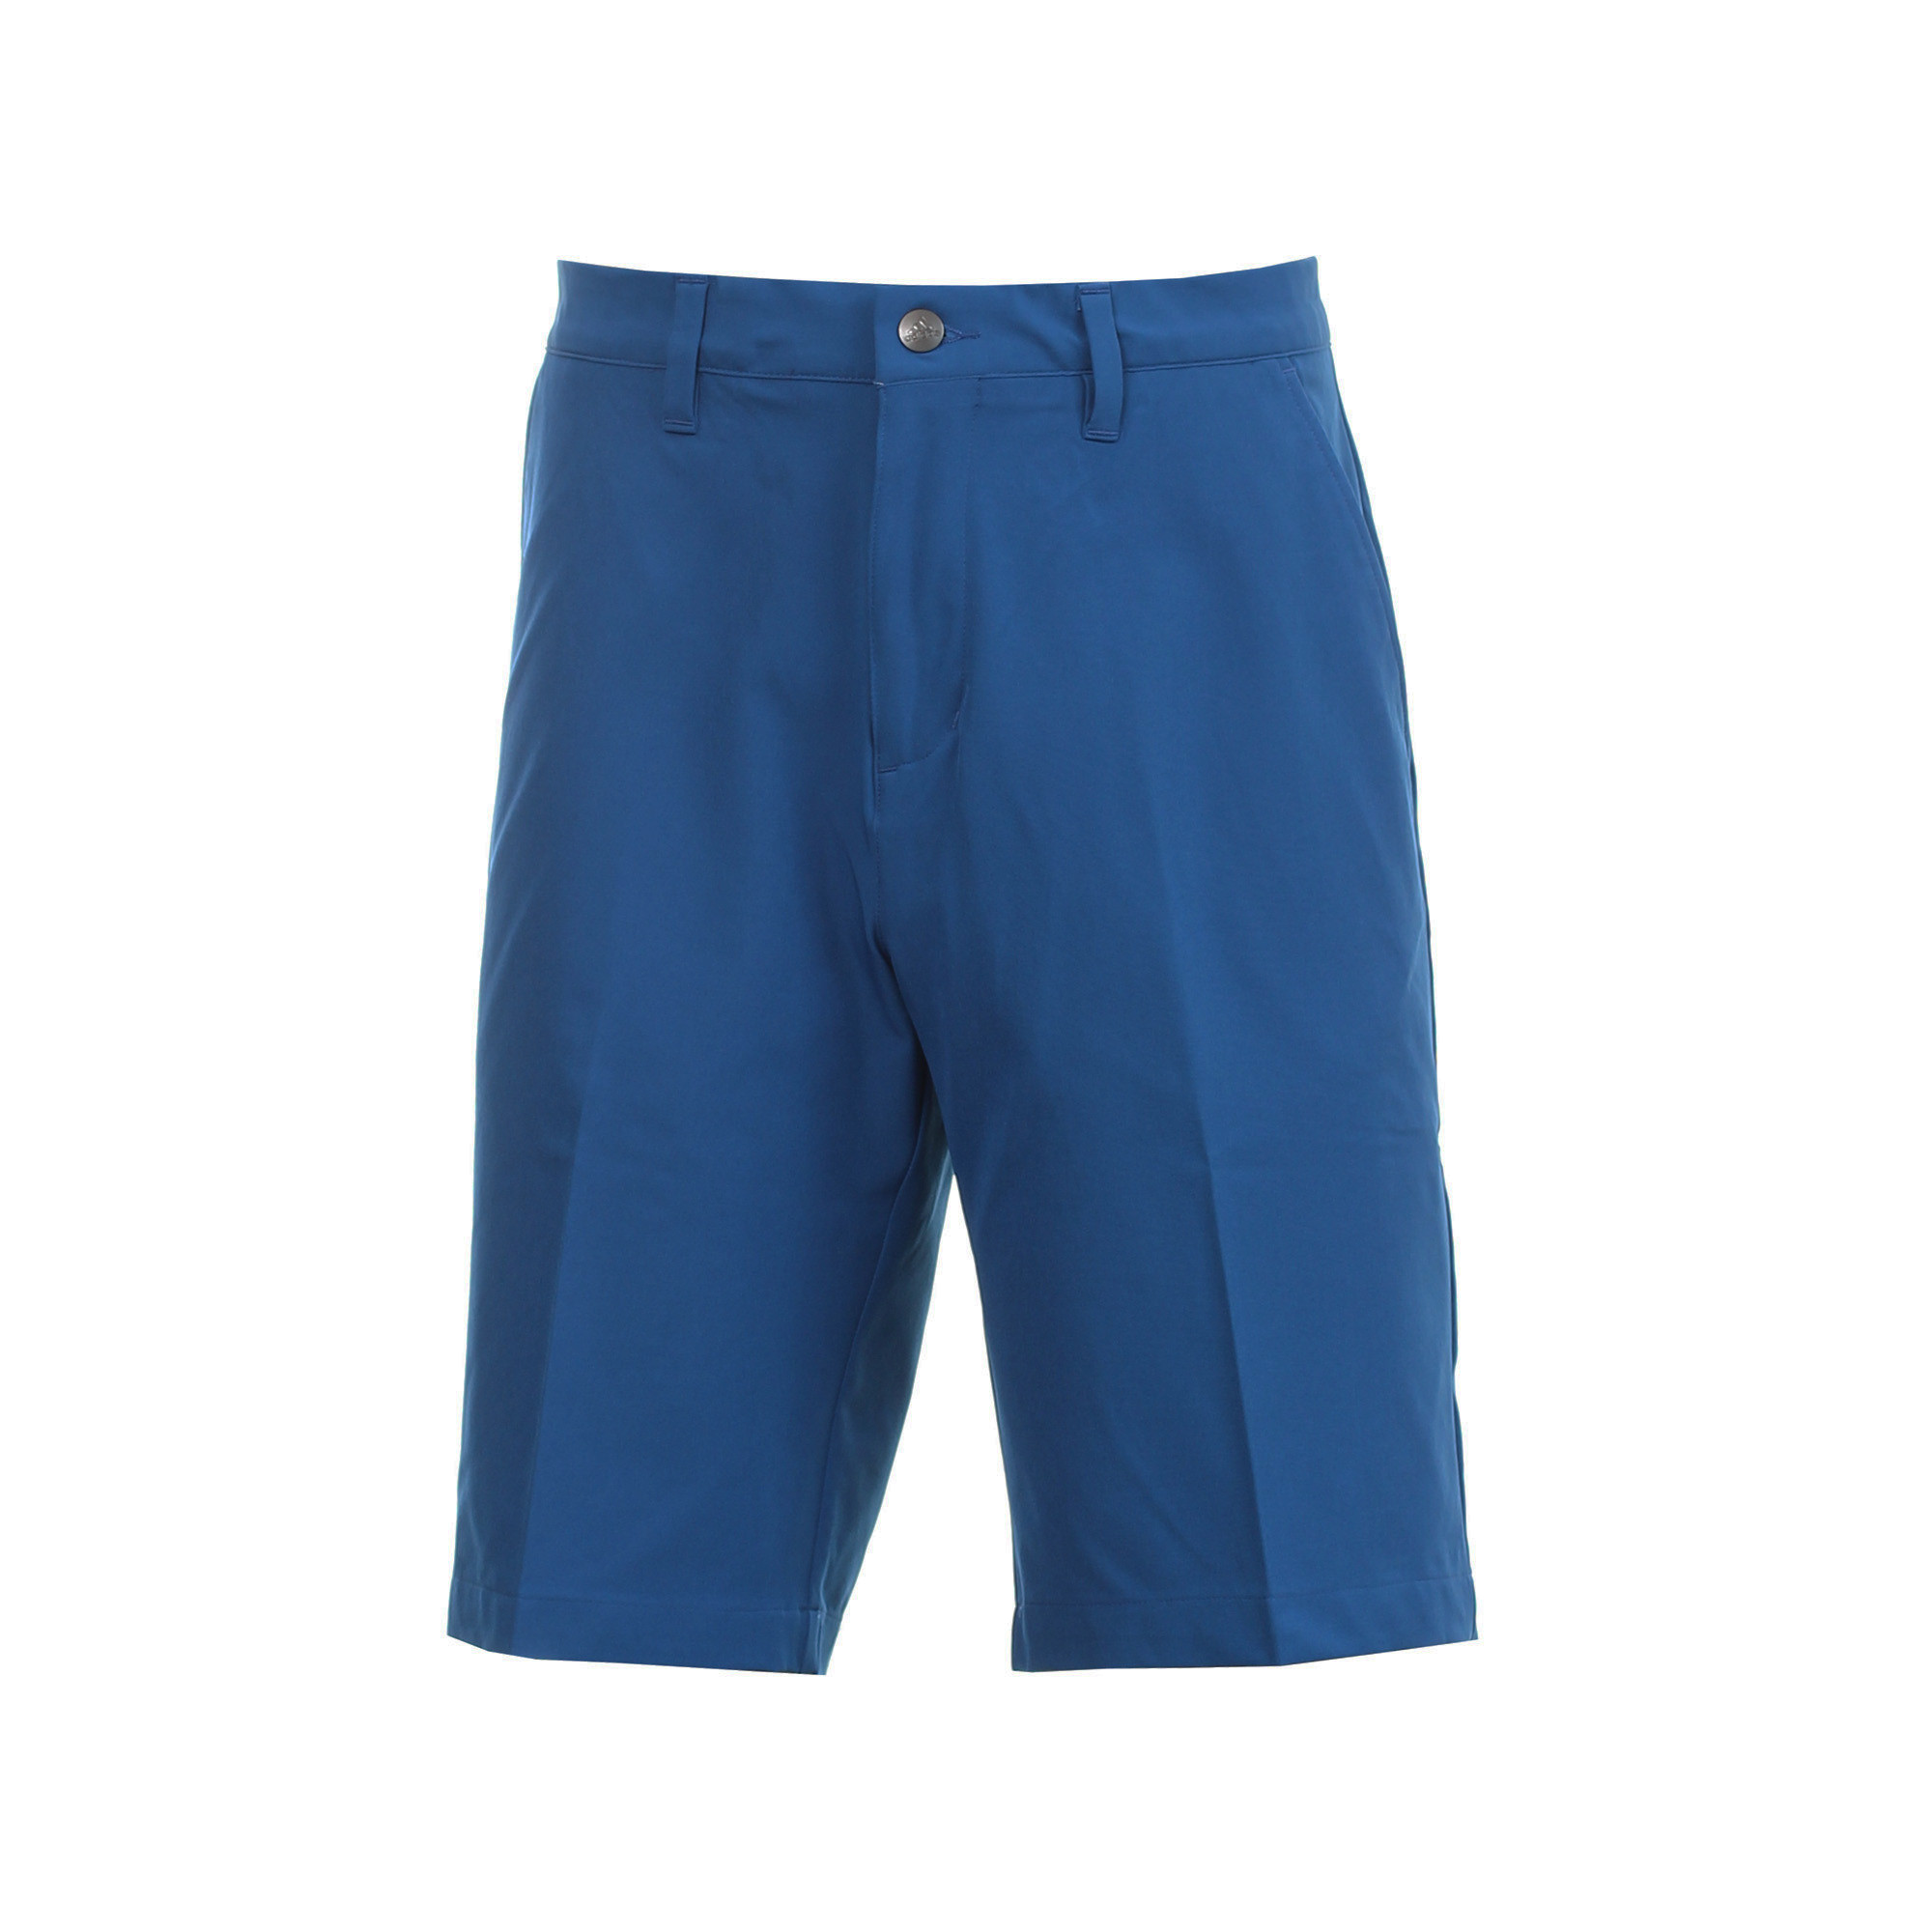 Adidas Men's Ultimate365 Dark Marine Shorts